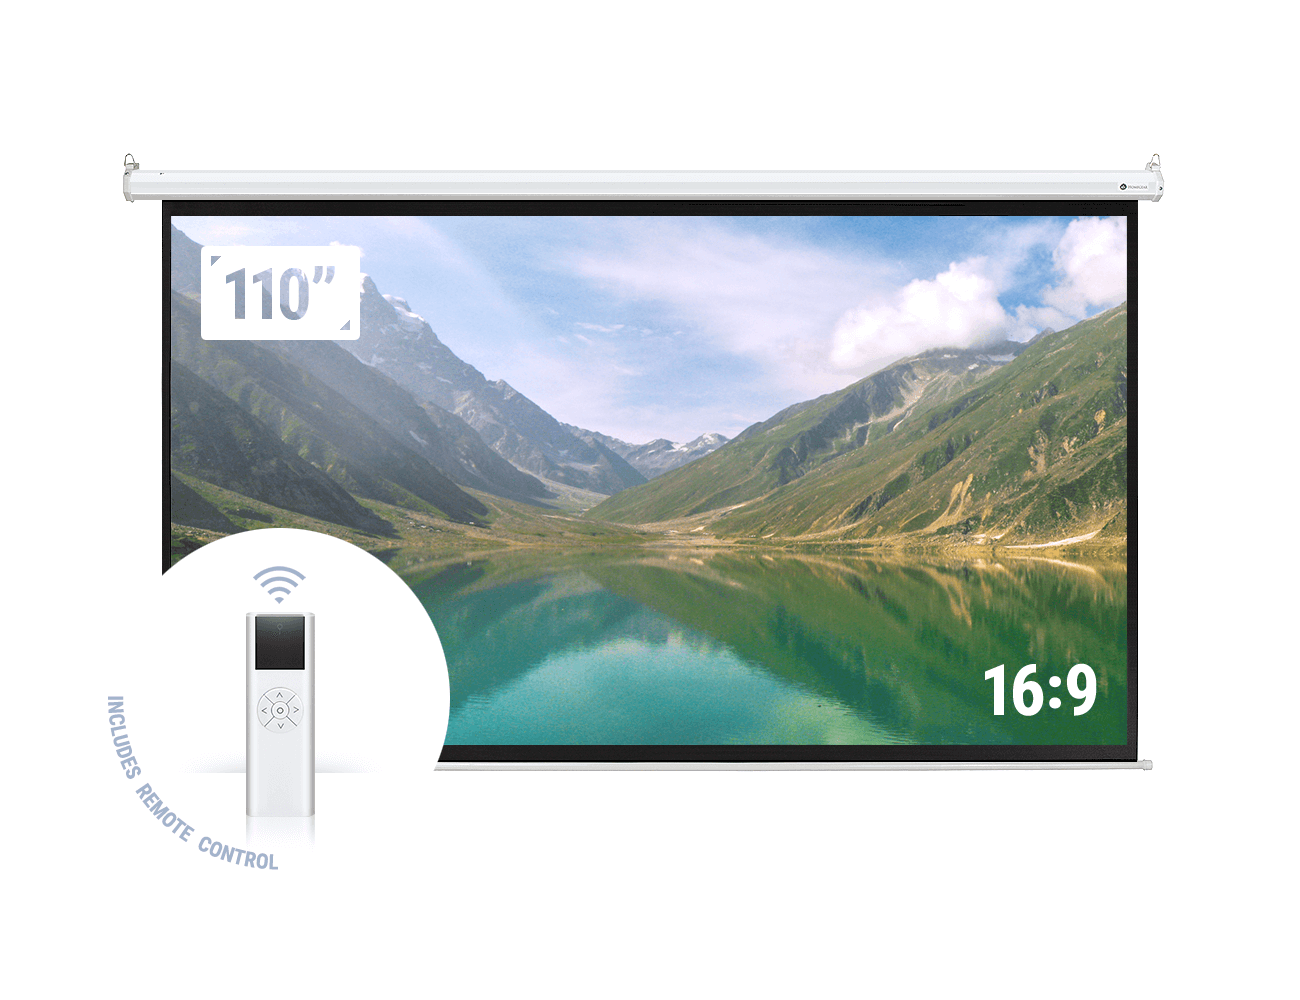 Homegear 110� 16:9 HD Electric Motorized Projector Screen + Remote by Homegear